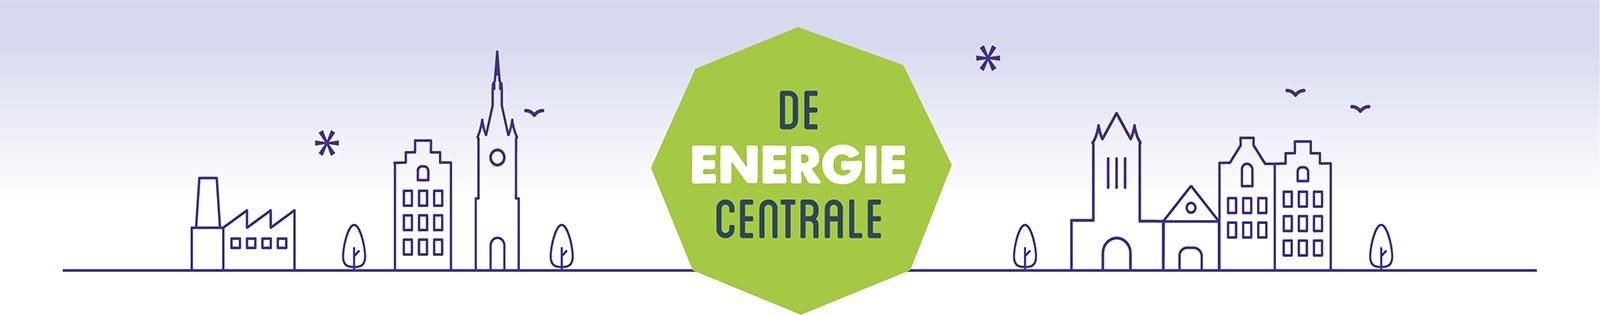 Energiecentrale - hero image